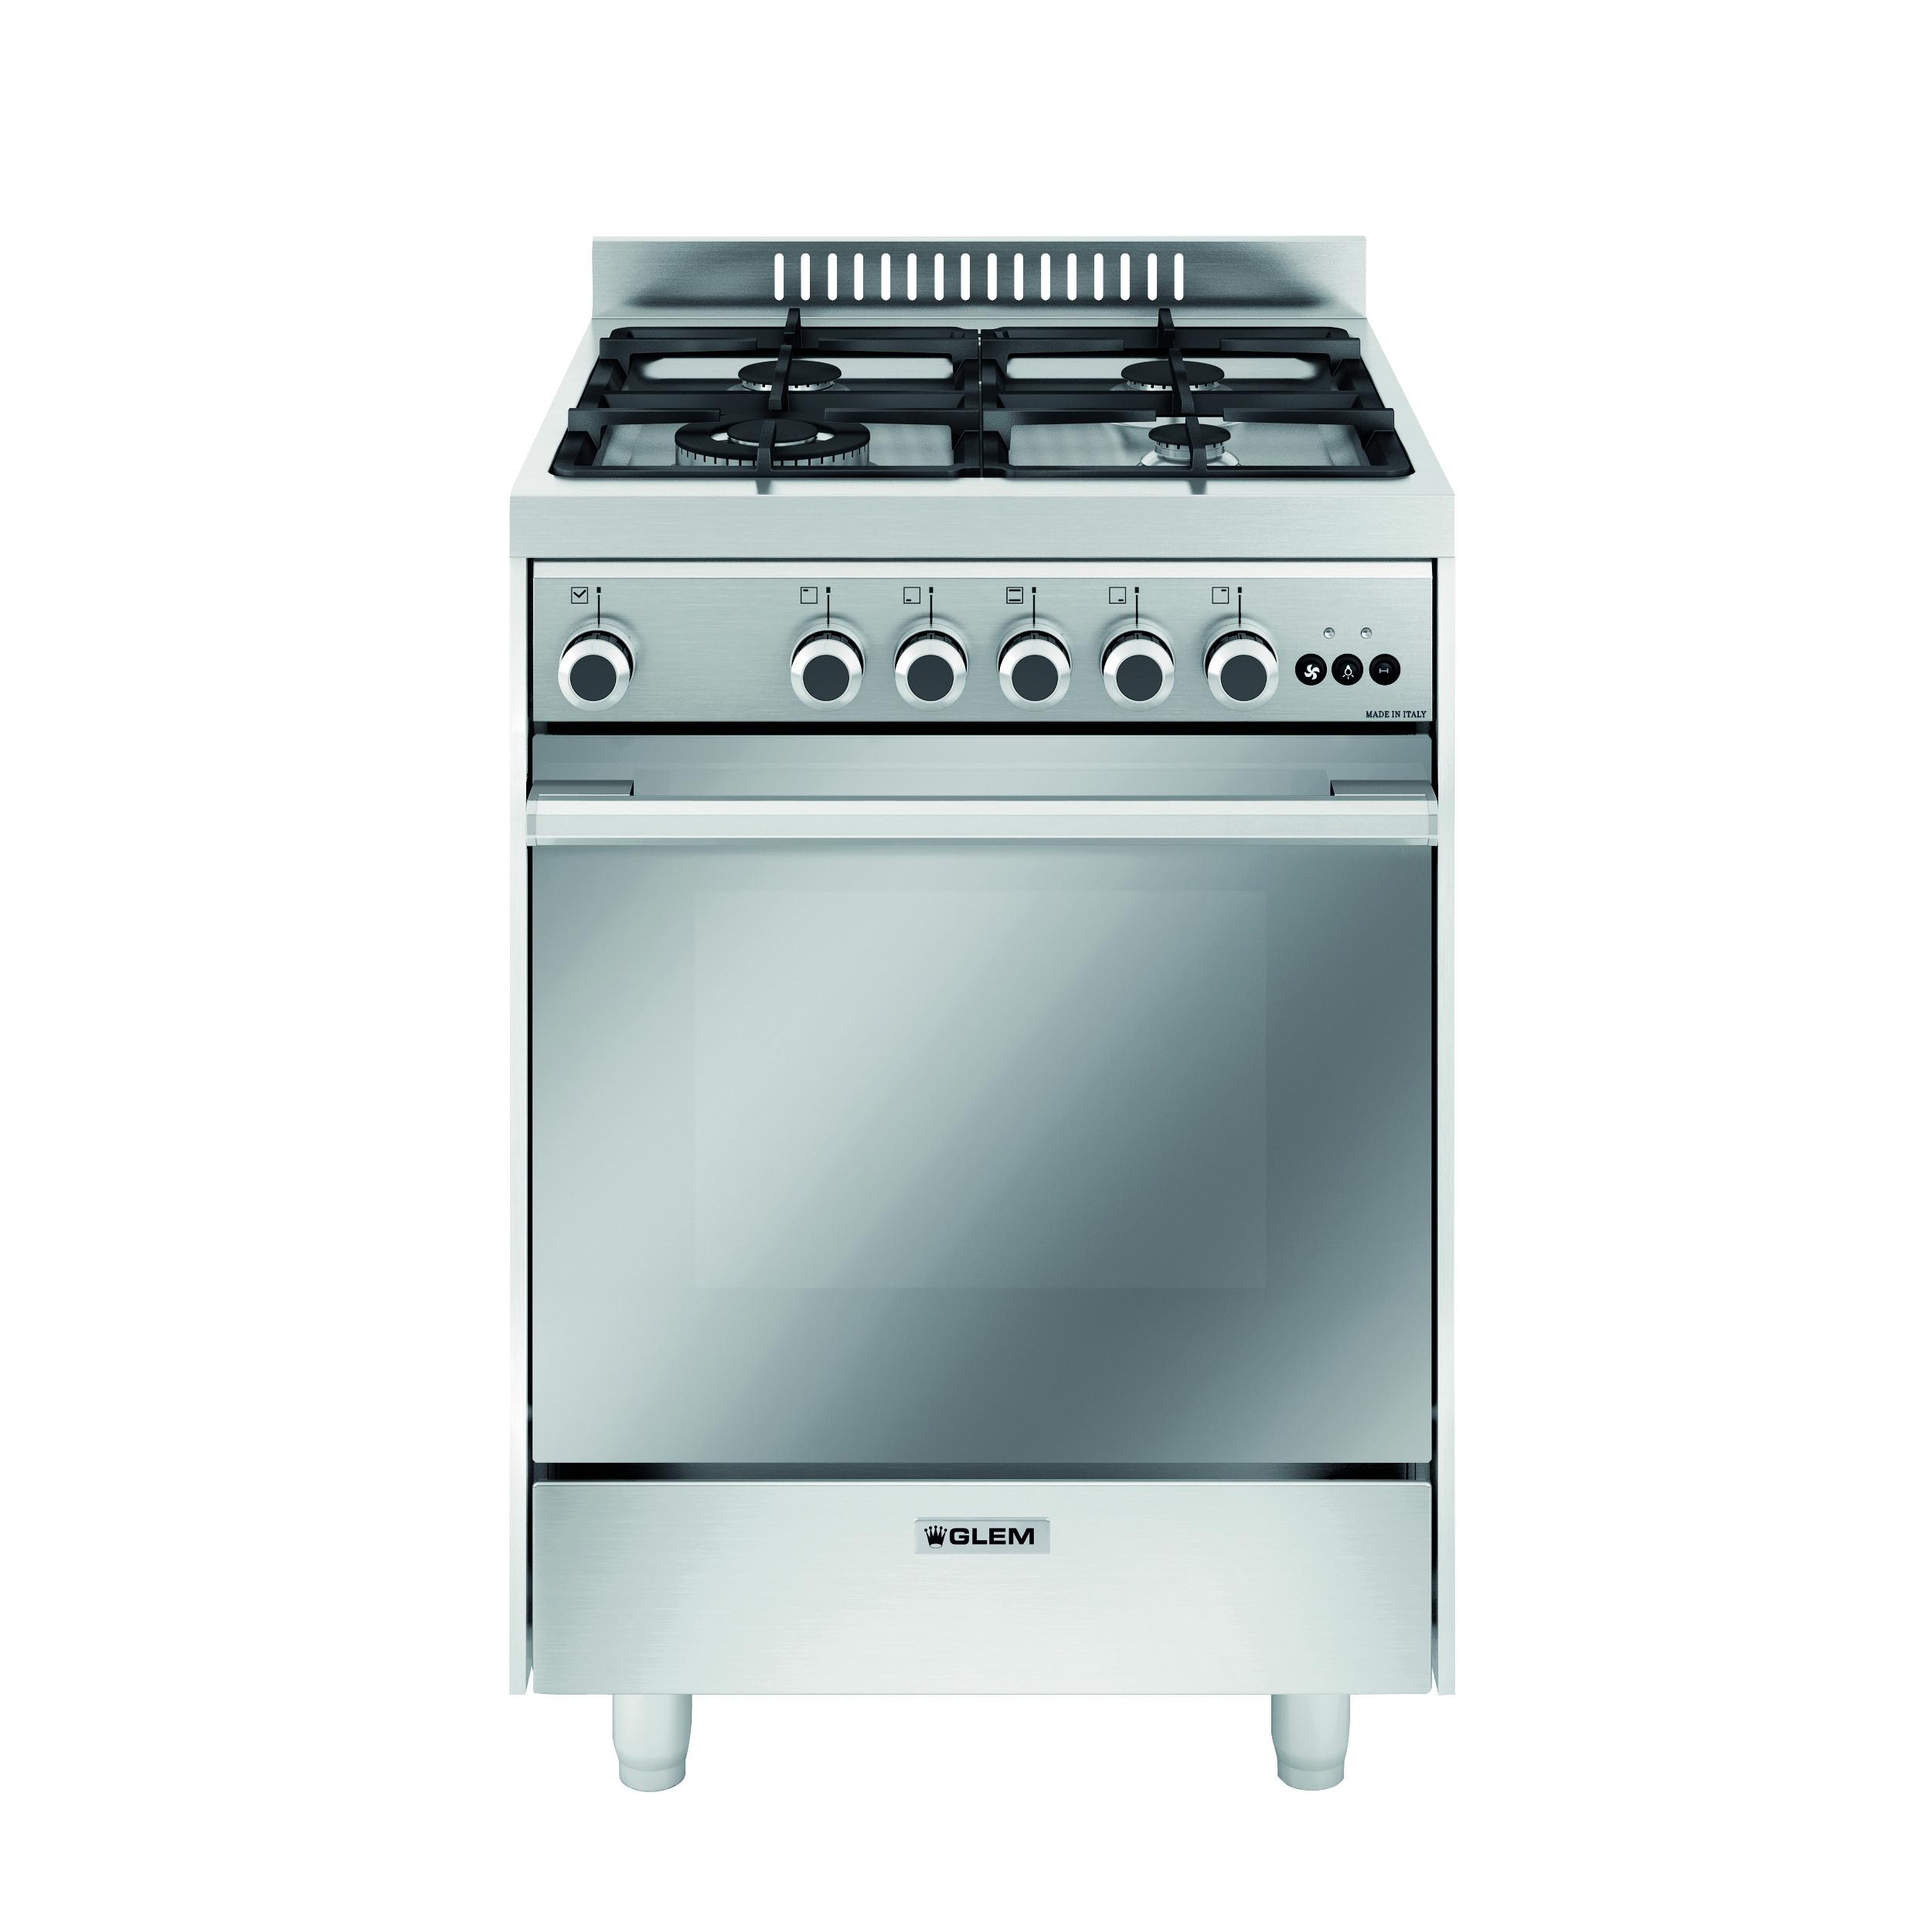 Gas oven Glem M664VI